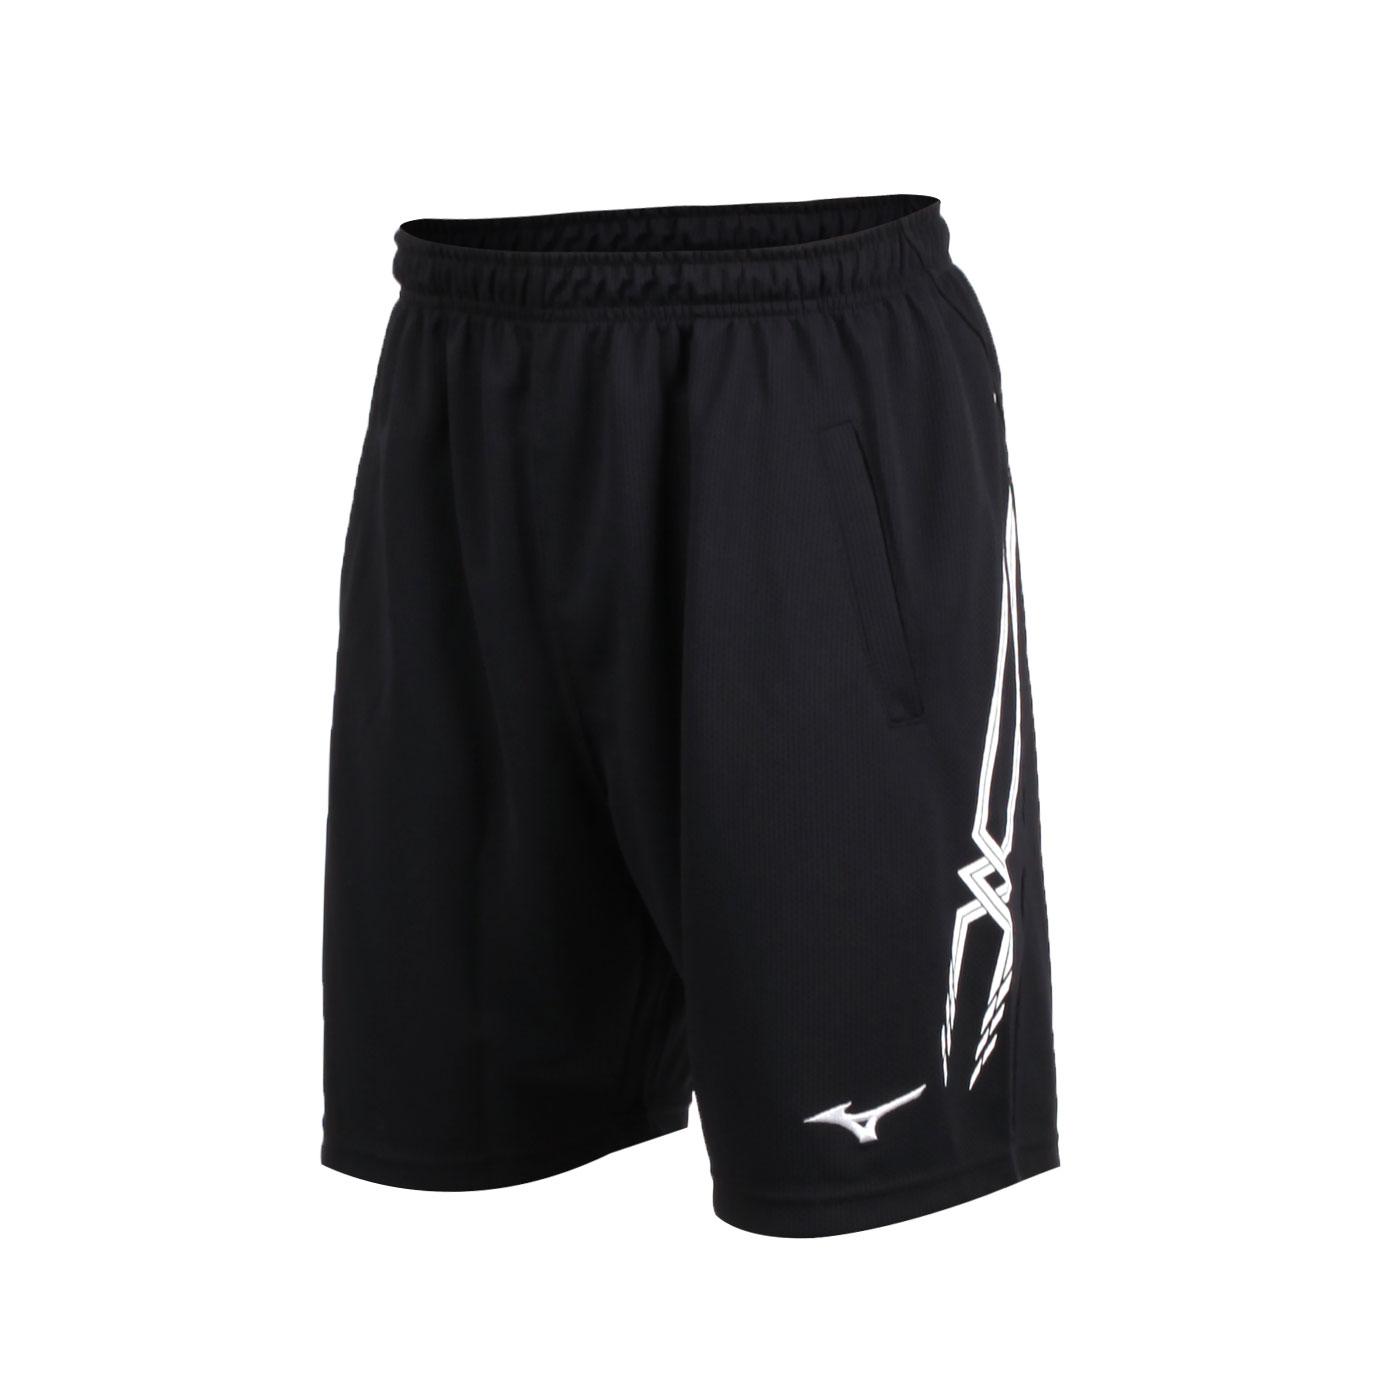 MIZUNO 男排球褲 V2TB7A0609 - 黑白